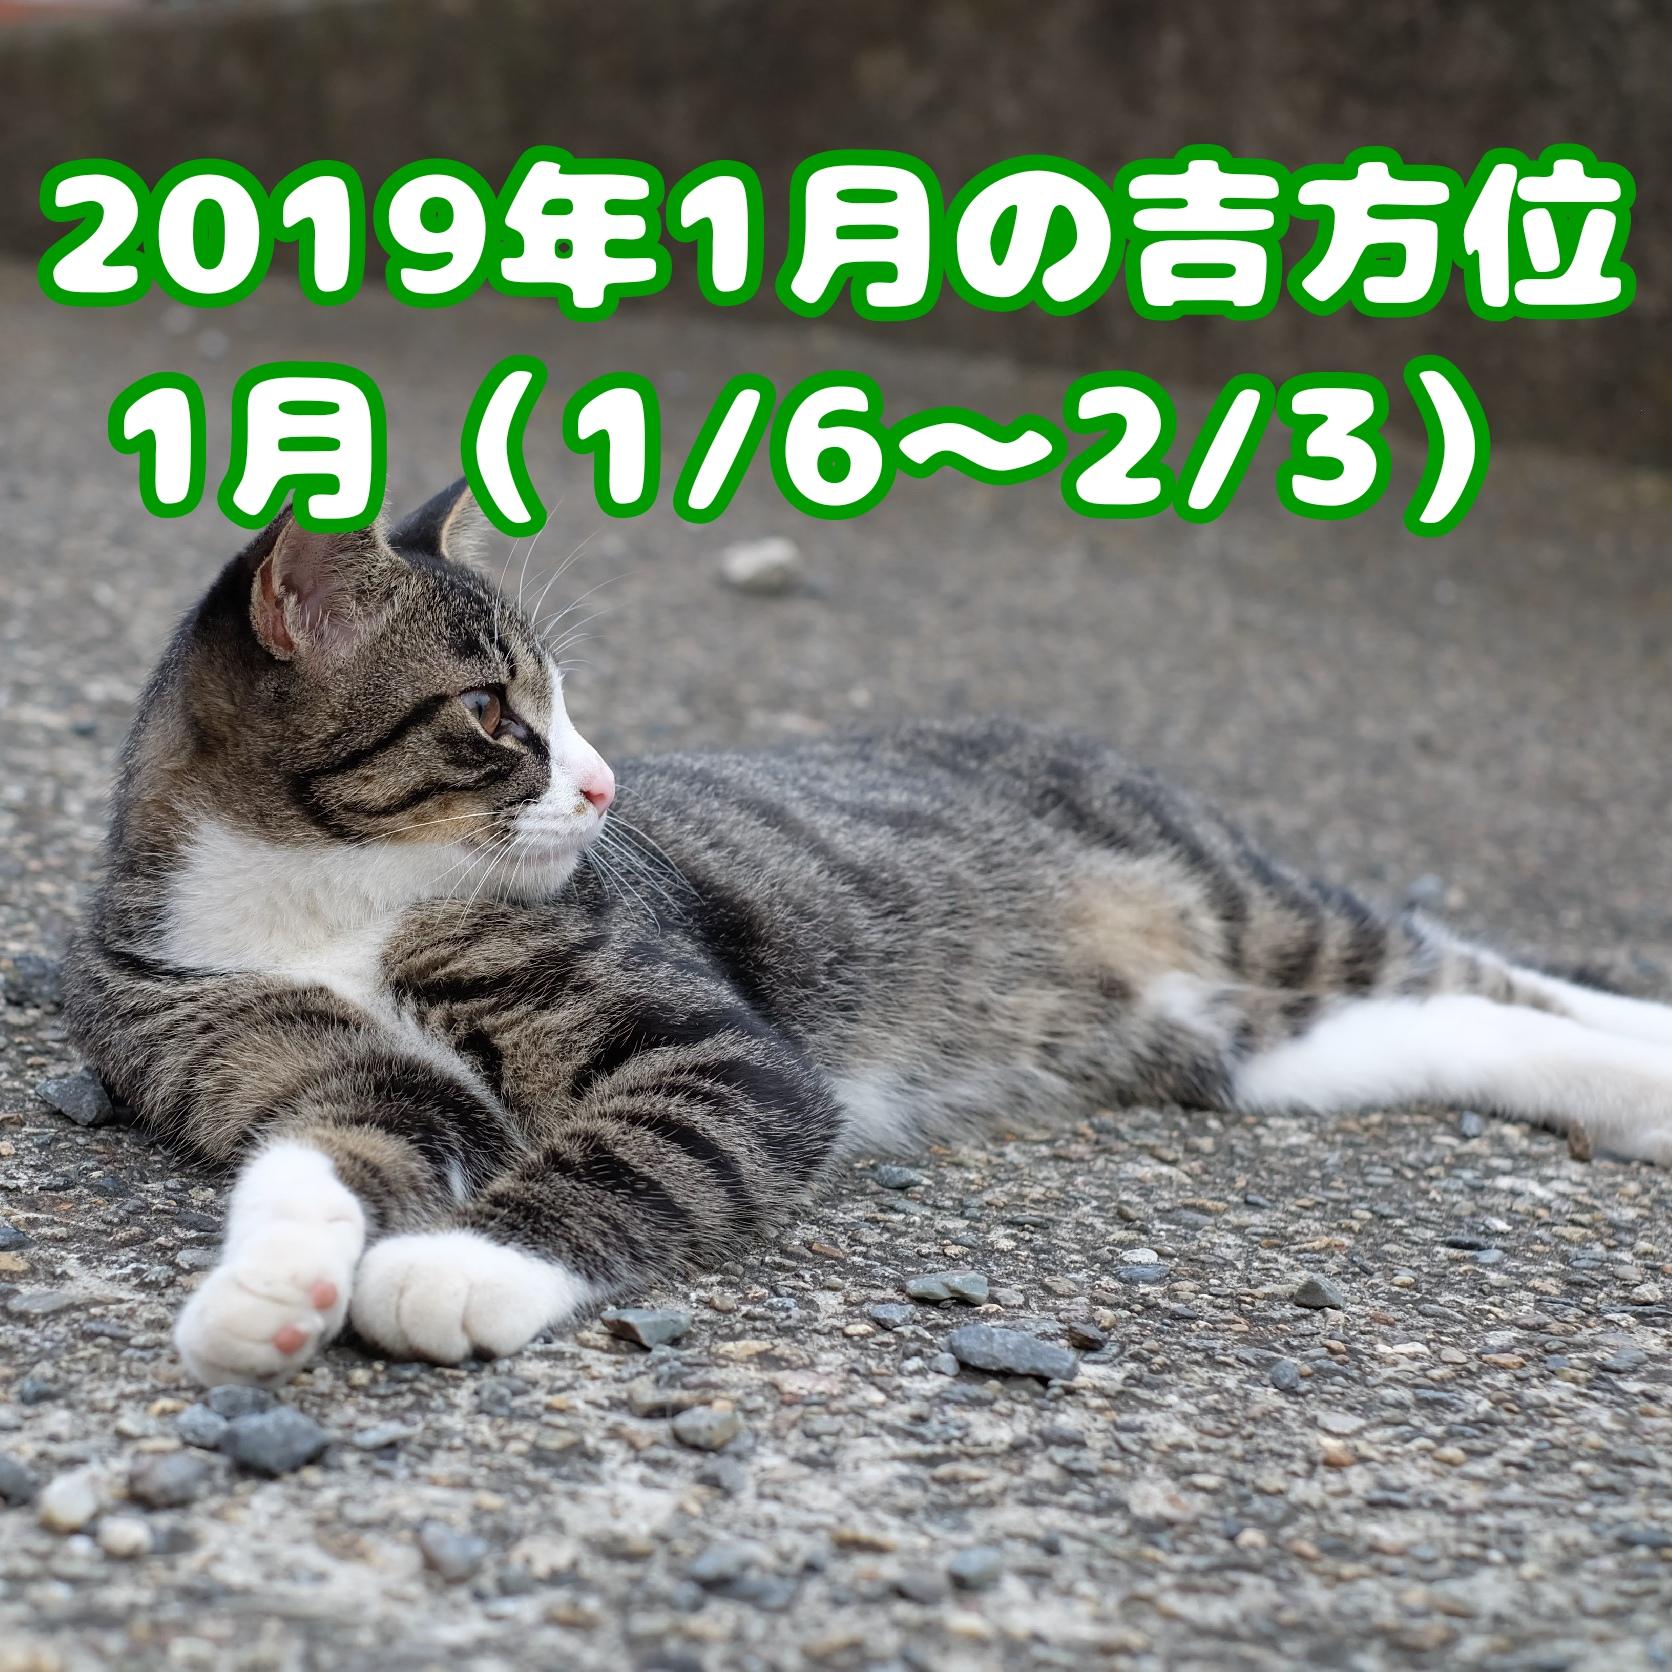 20181210_2046_42590